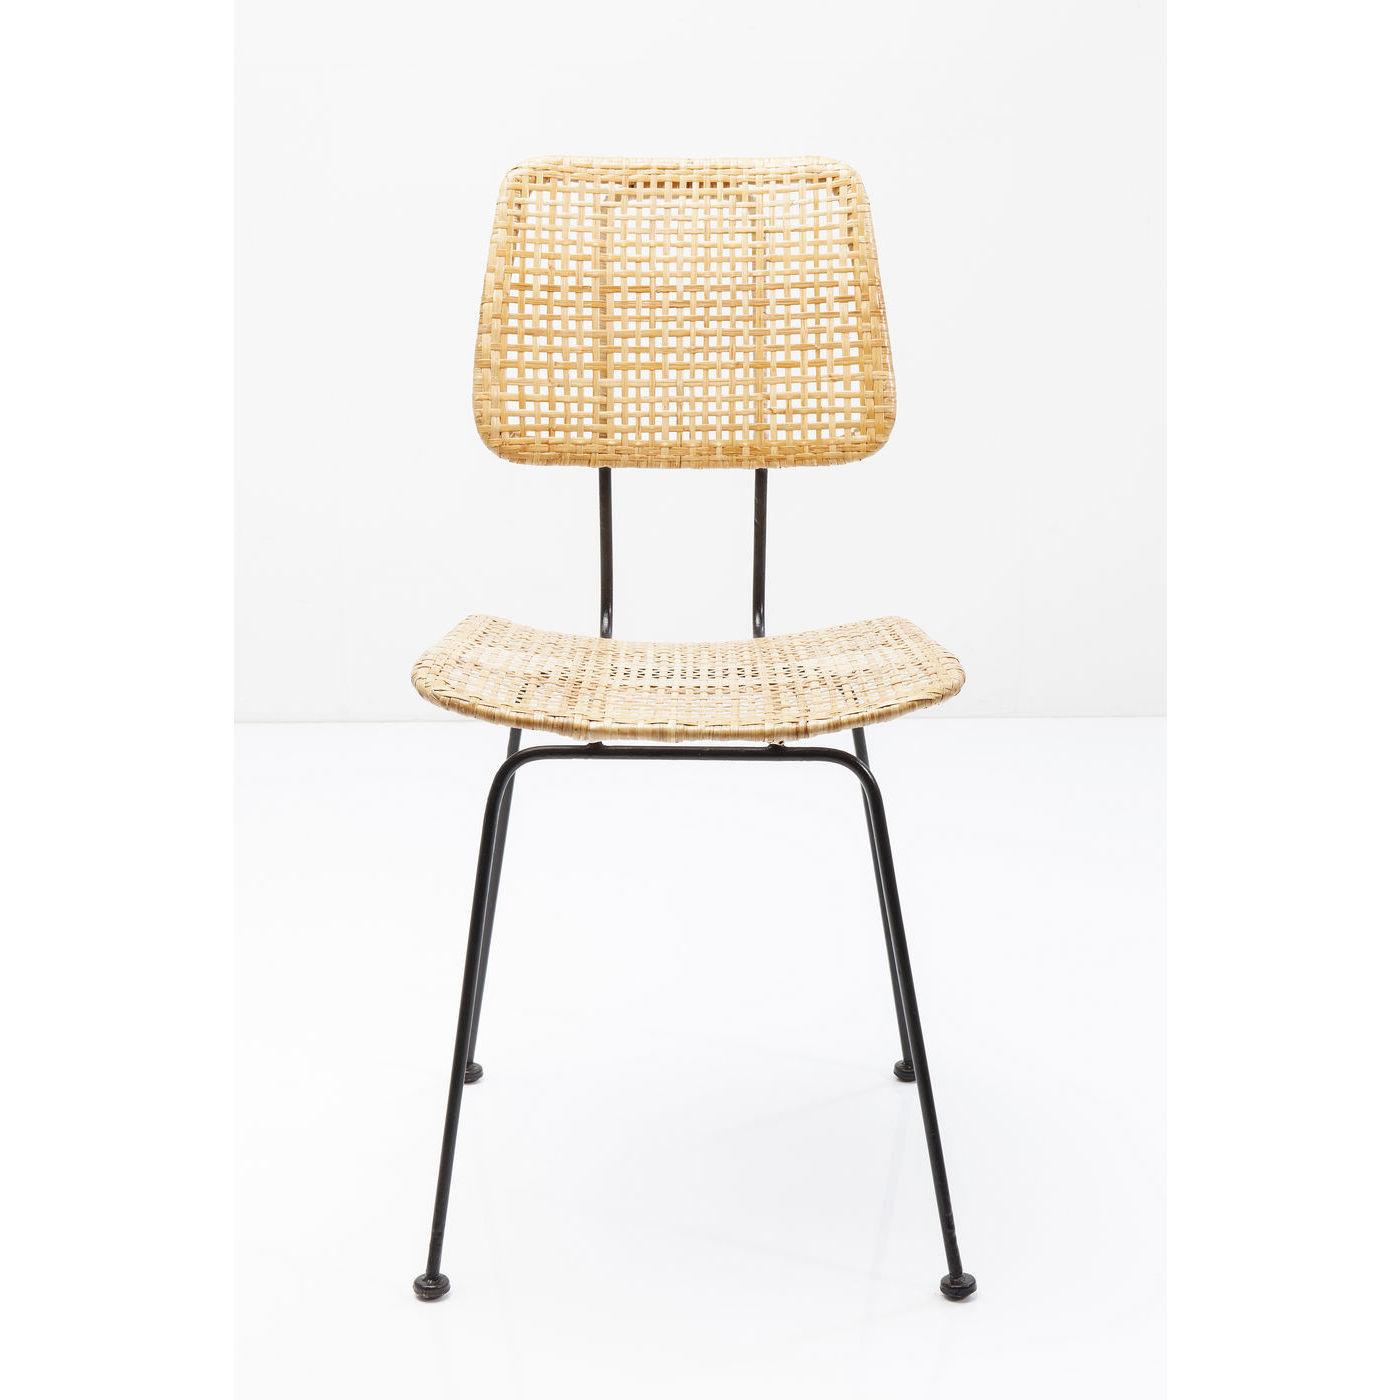 kare design – Kare design chiang mai spisebordsstol - natur rattan/sort stål fra boboonline.dk